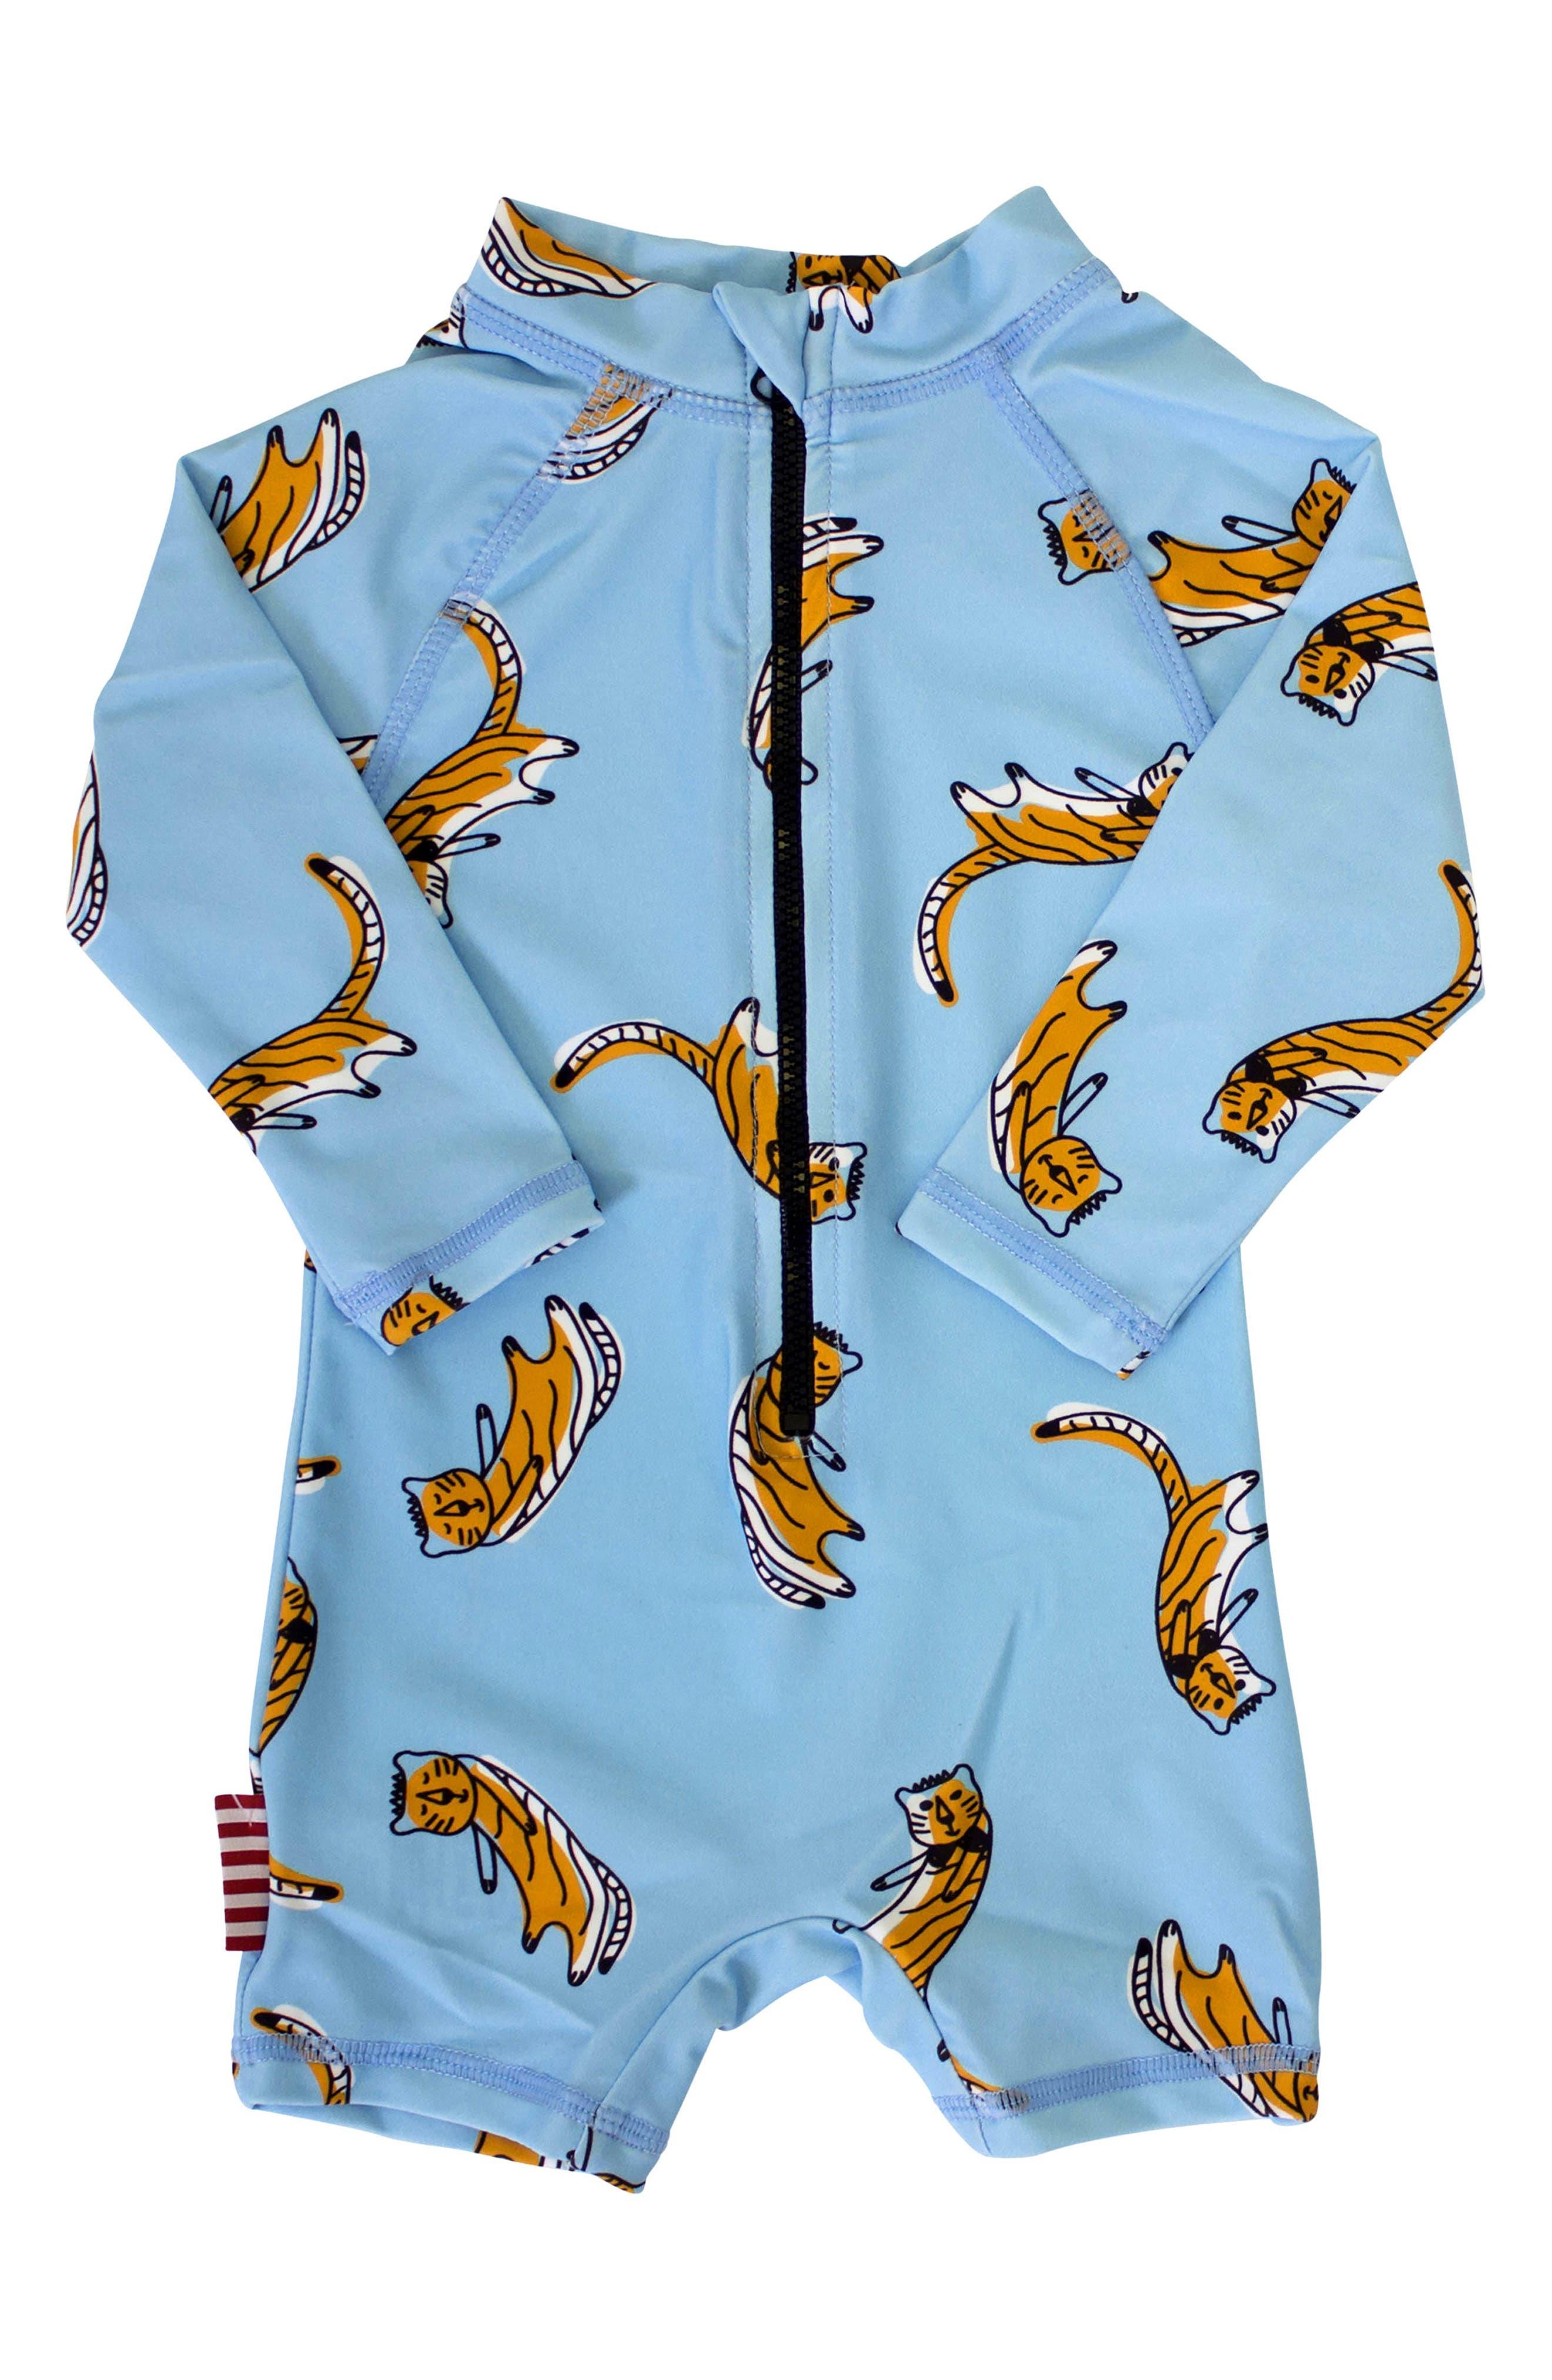 SOOKIbaby Cool Cat One-Piece Rashguard Swimsuit (Baby)